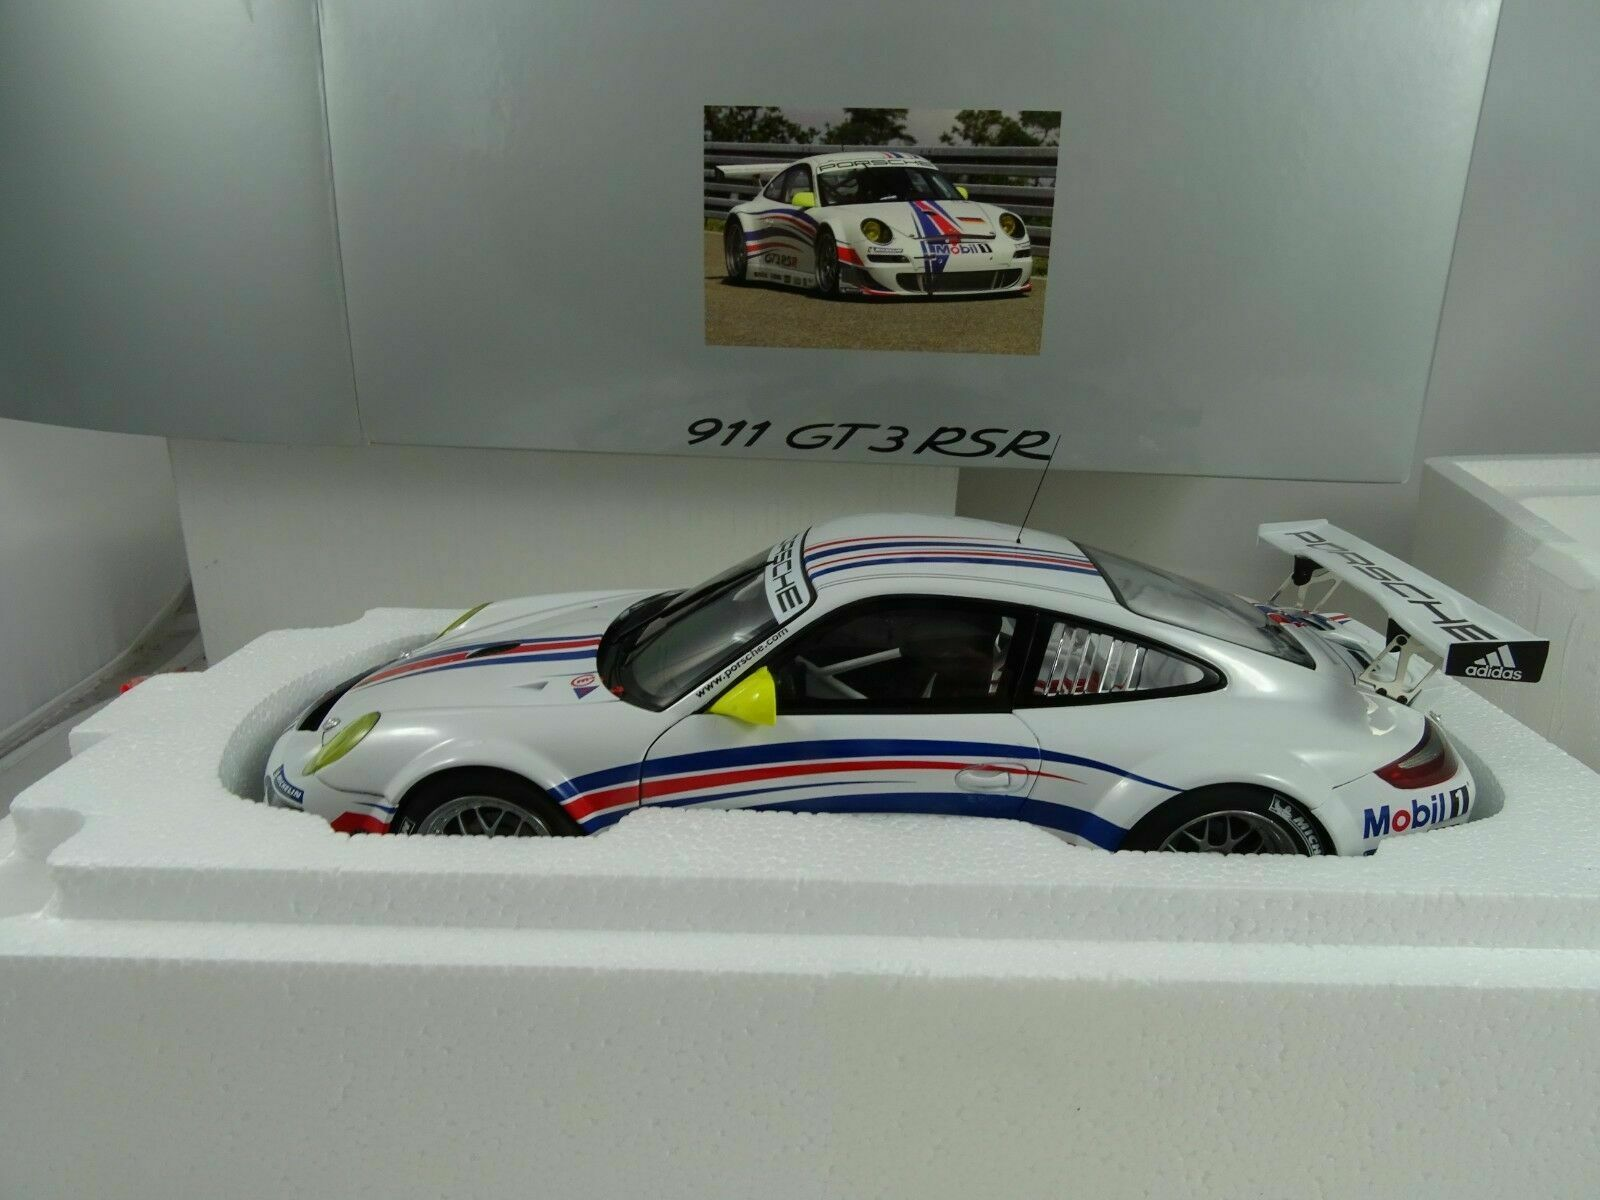 1 18 Autoart Dealermodell  WAP02100618 Porsche 911 GT3 Rsr Nuevo Embalaje